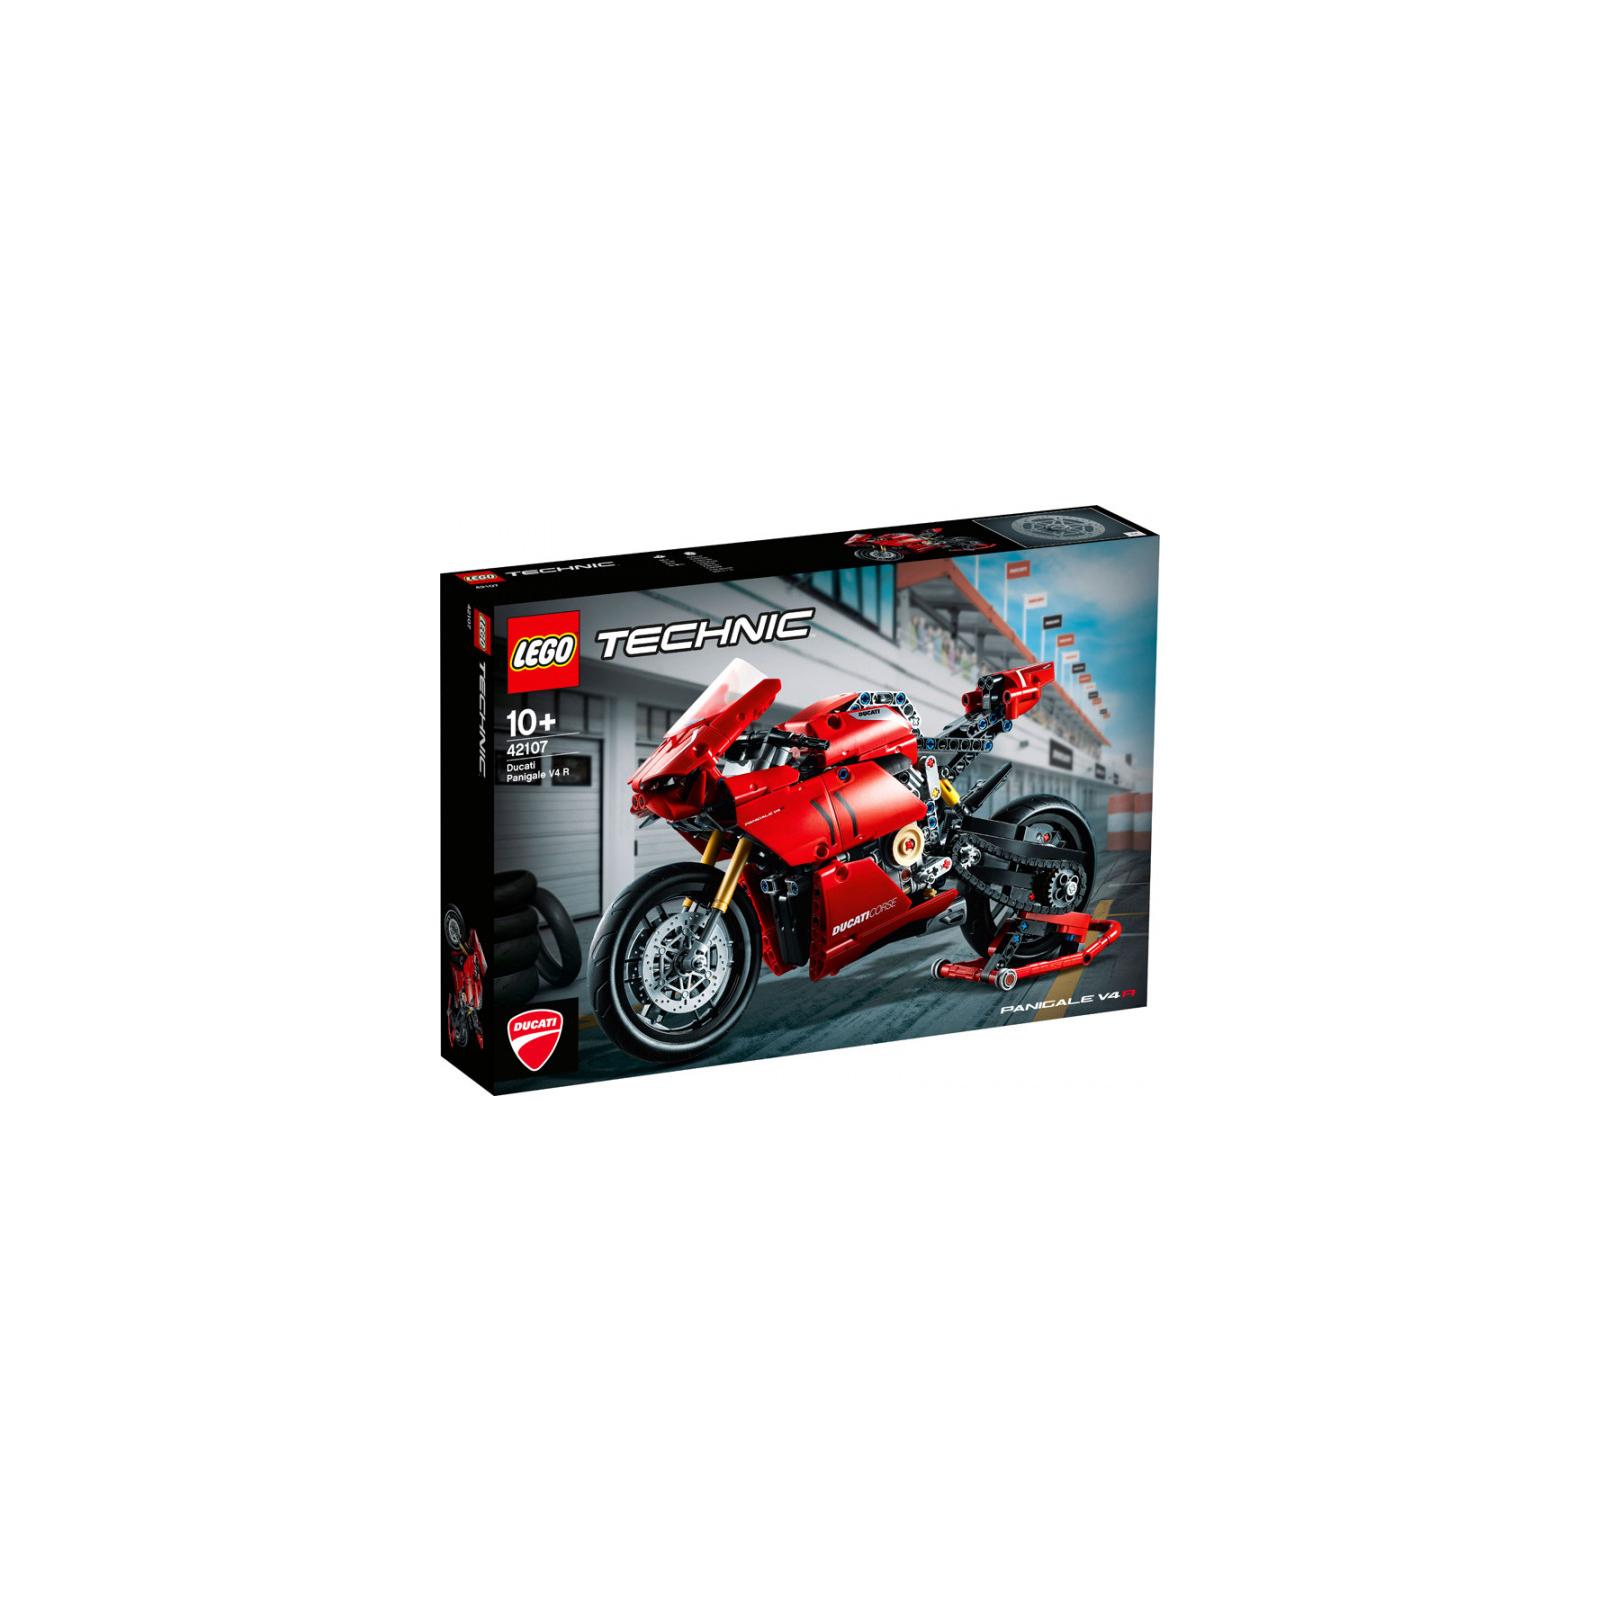 Конструктор LEGO Technic Ducati Panigale V4 R 0 646 детали (42107)